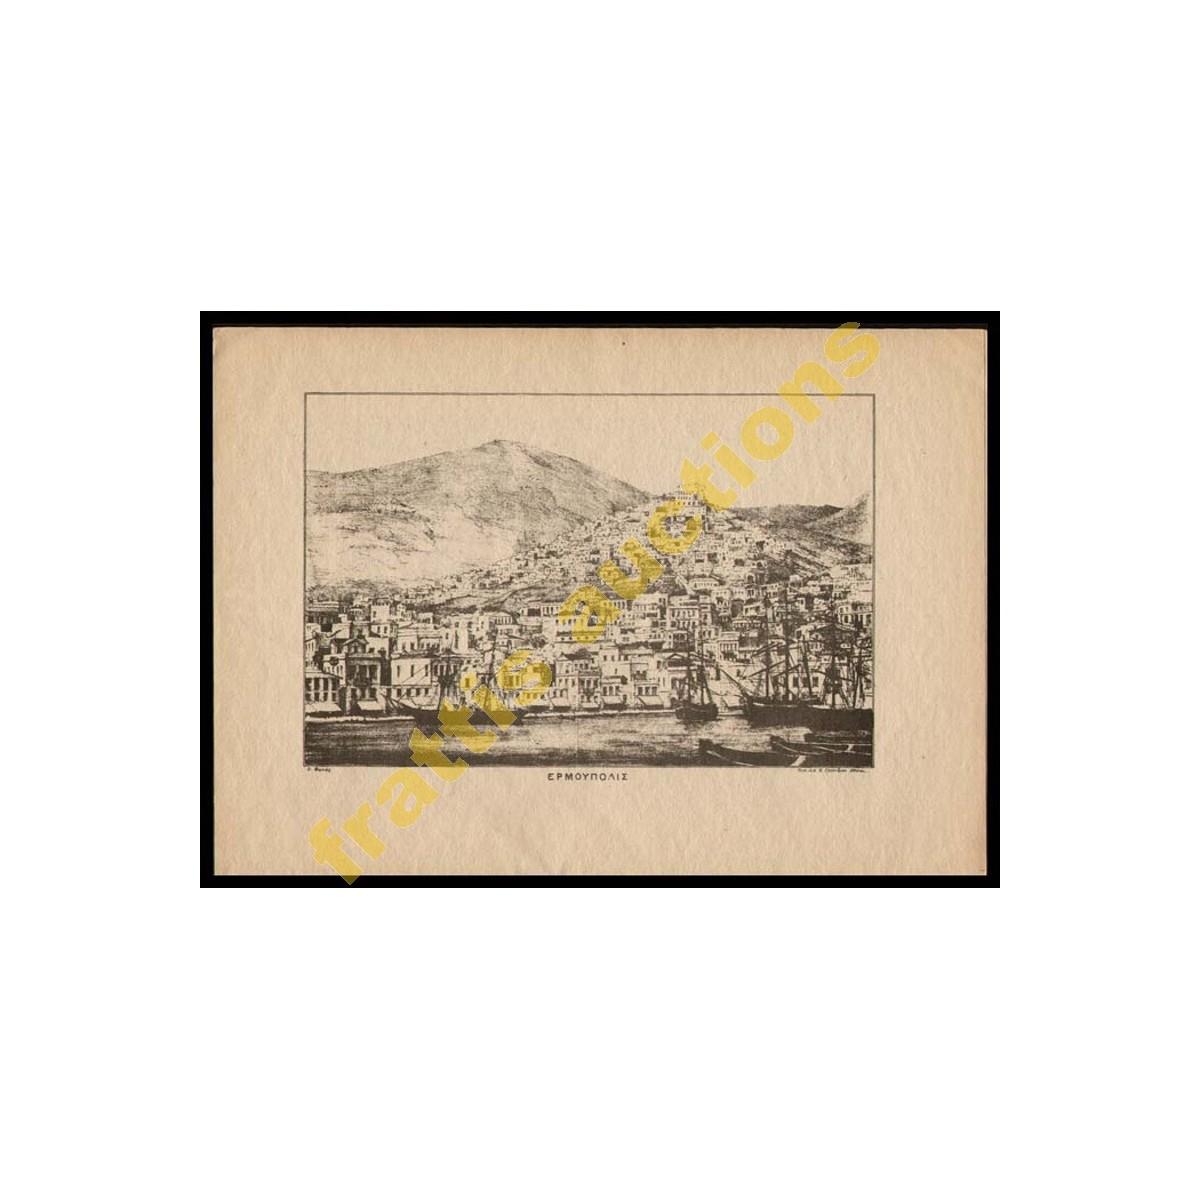 Eκτύπωση Χαρακτικού της Ερμούπολης τον 18ο αι.